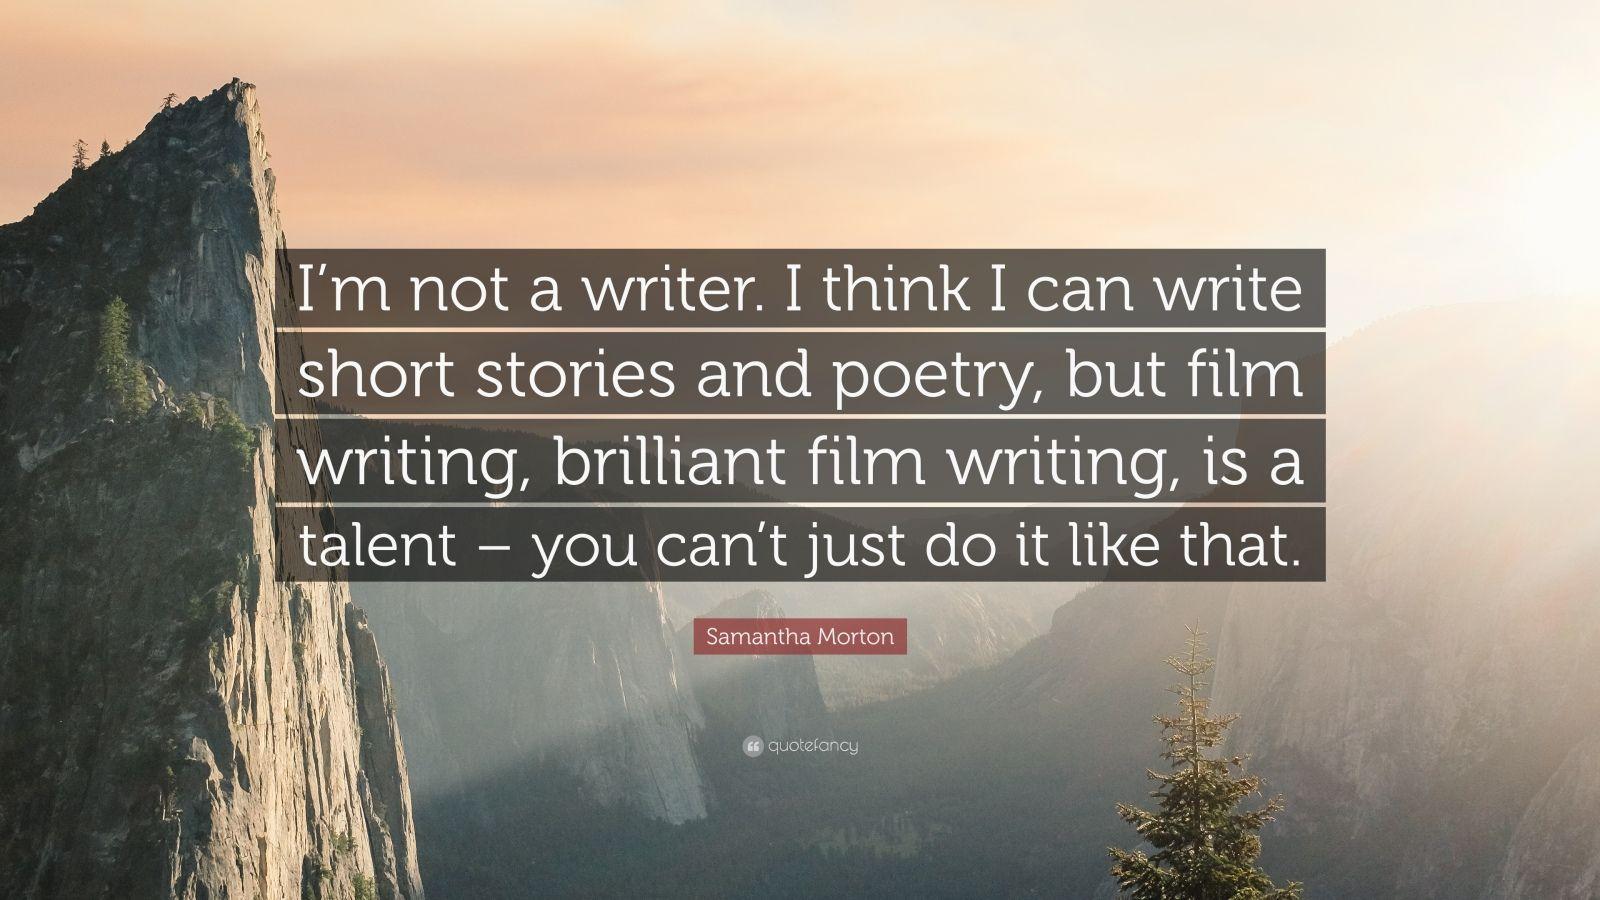 Should I write a short story before writing a screenplay?